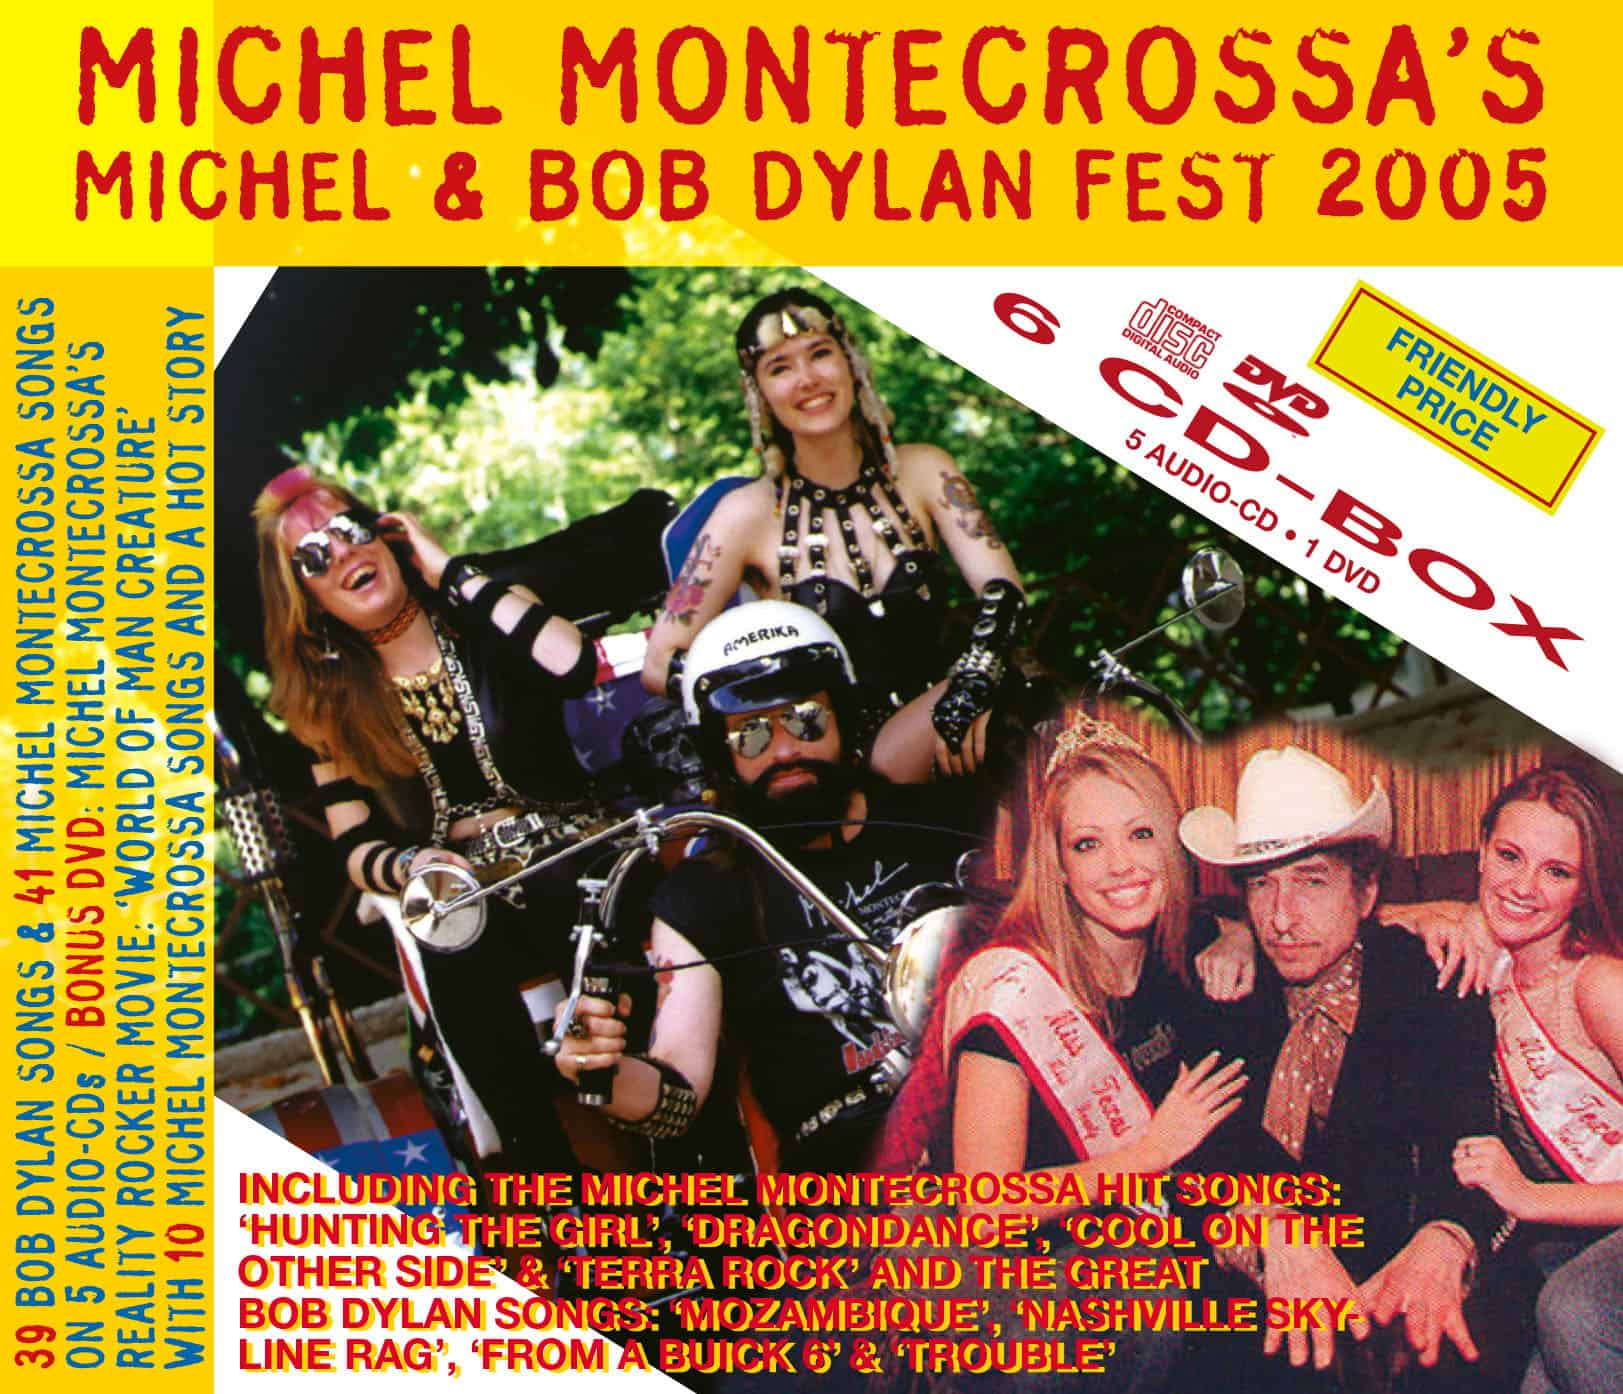 Michel Montecrossa's Michel & Bob Dylan Fest 2005